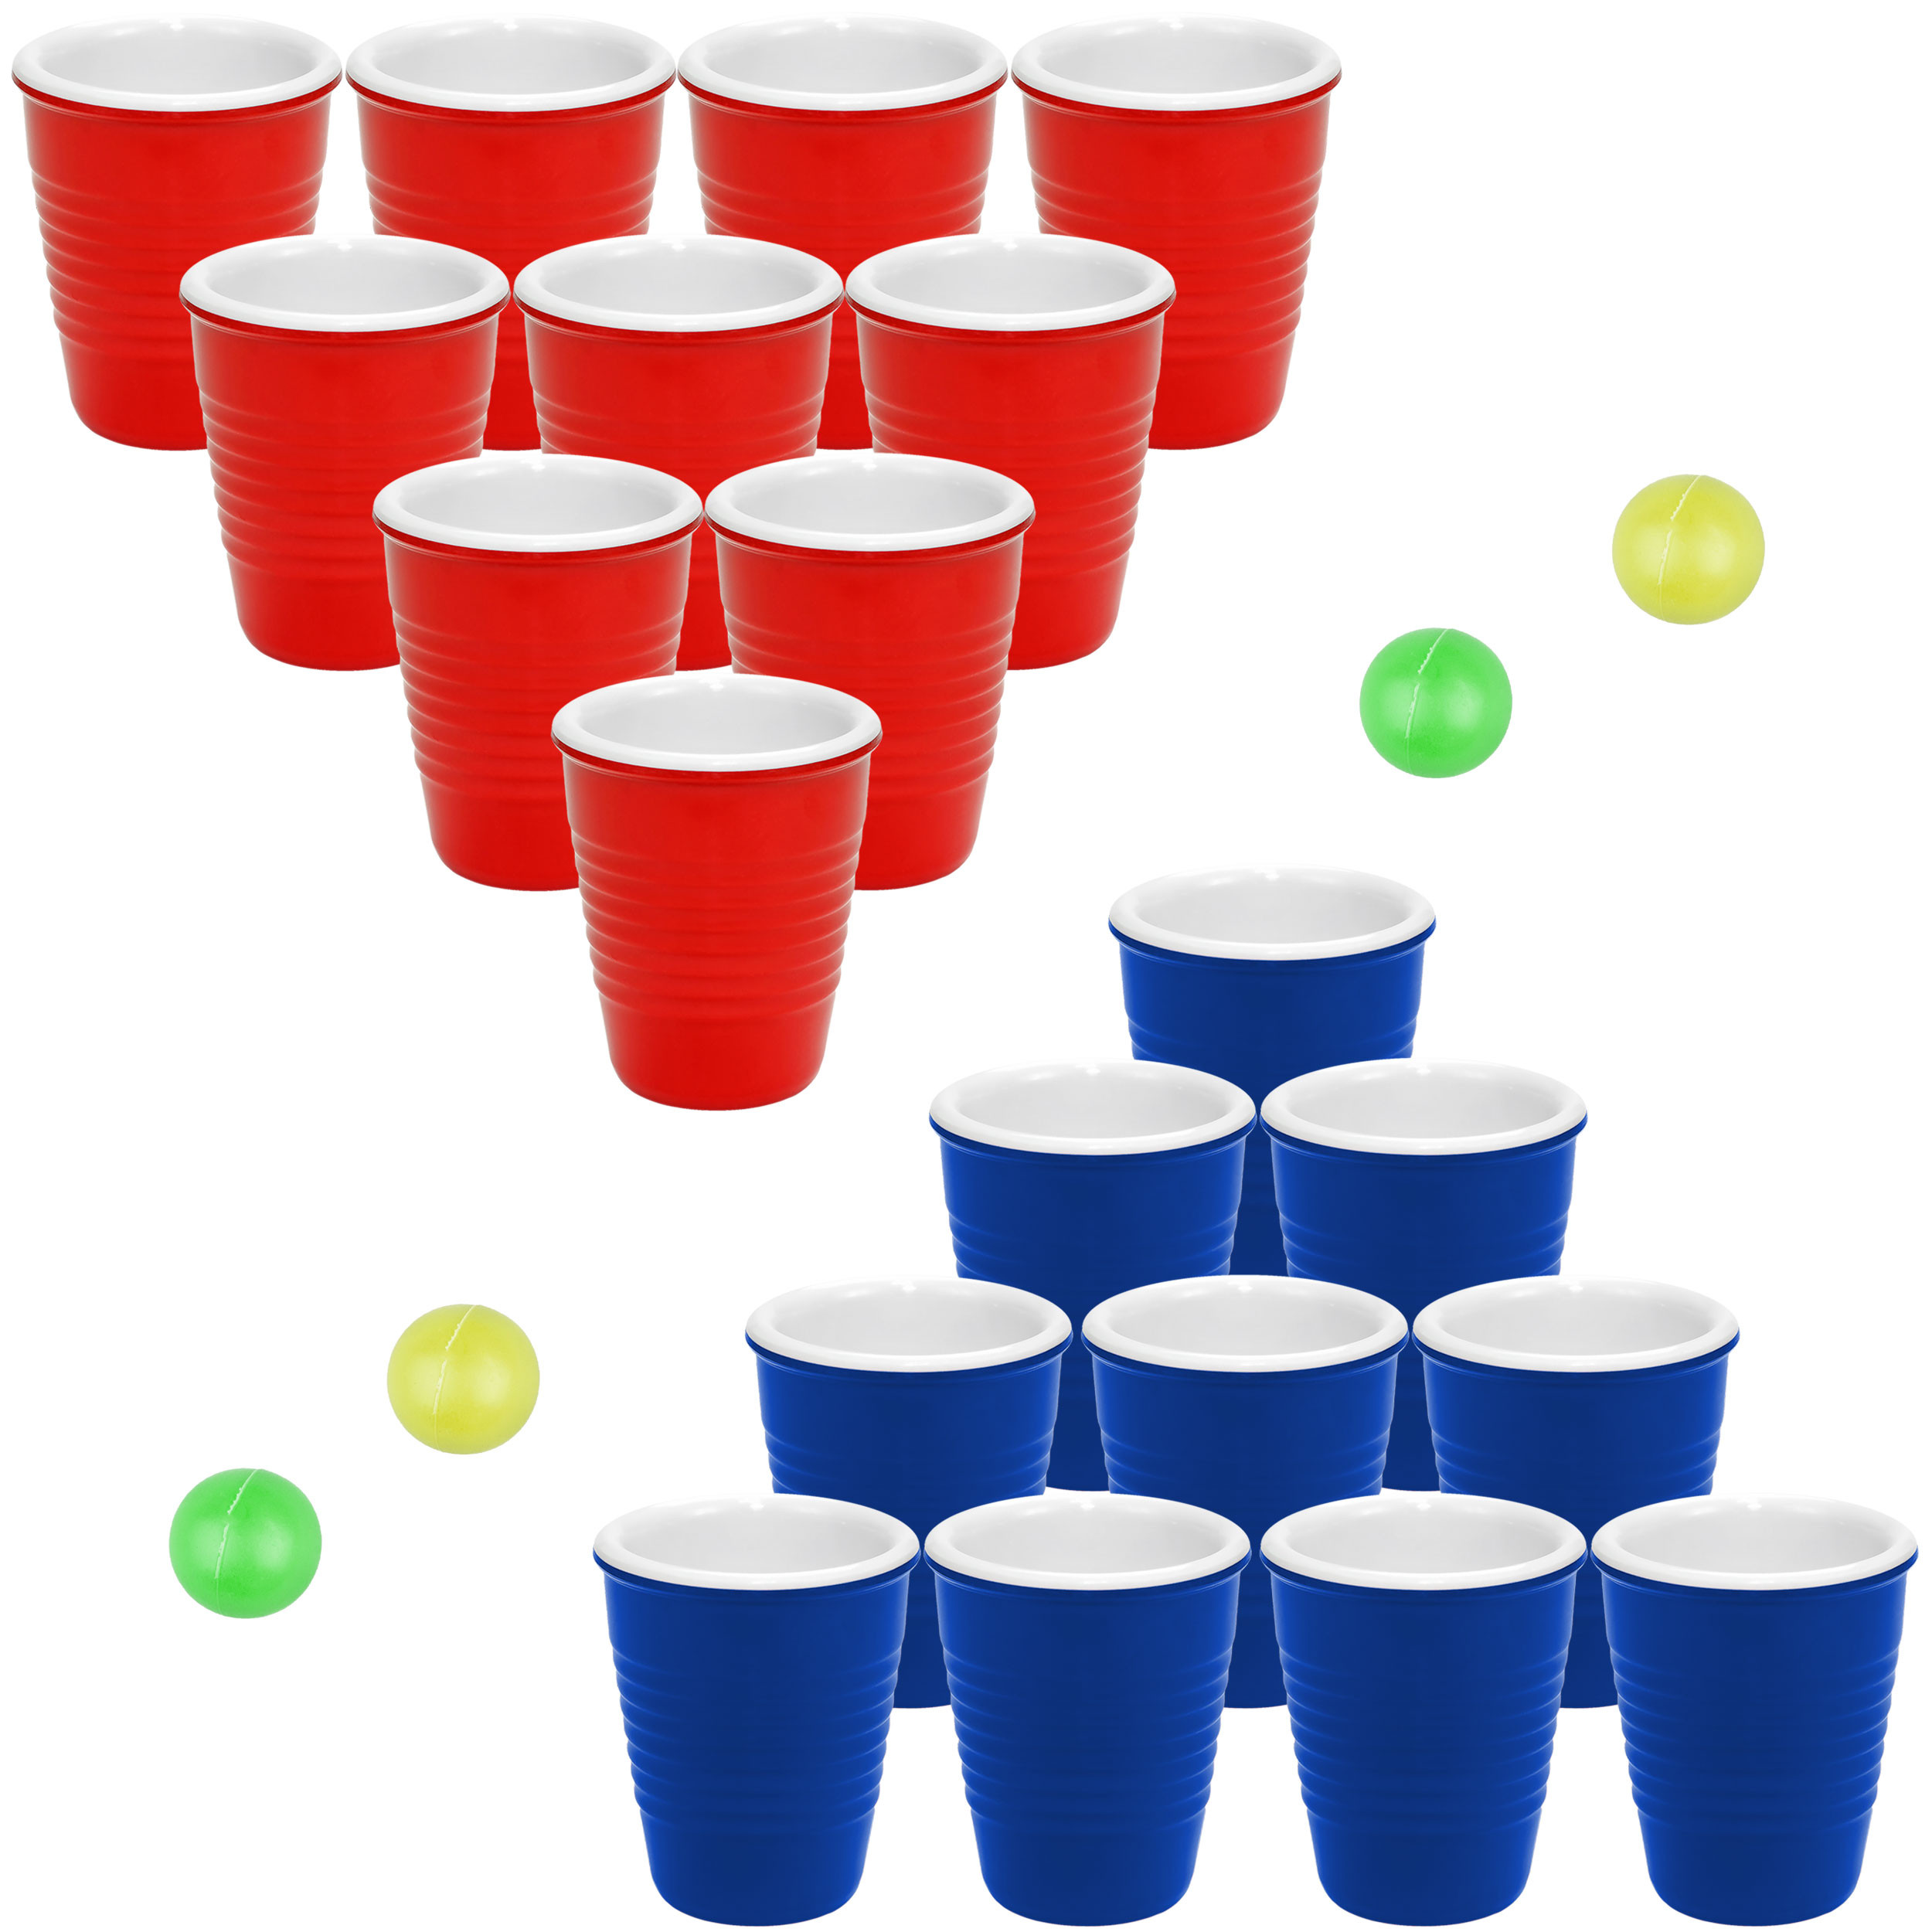 Pro Series Shot Pong Set - Fairly Odd Novelties - Drinking Game w/ 20 Hard Plastic Shot Glasses Gift